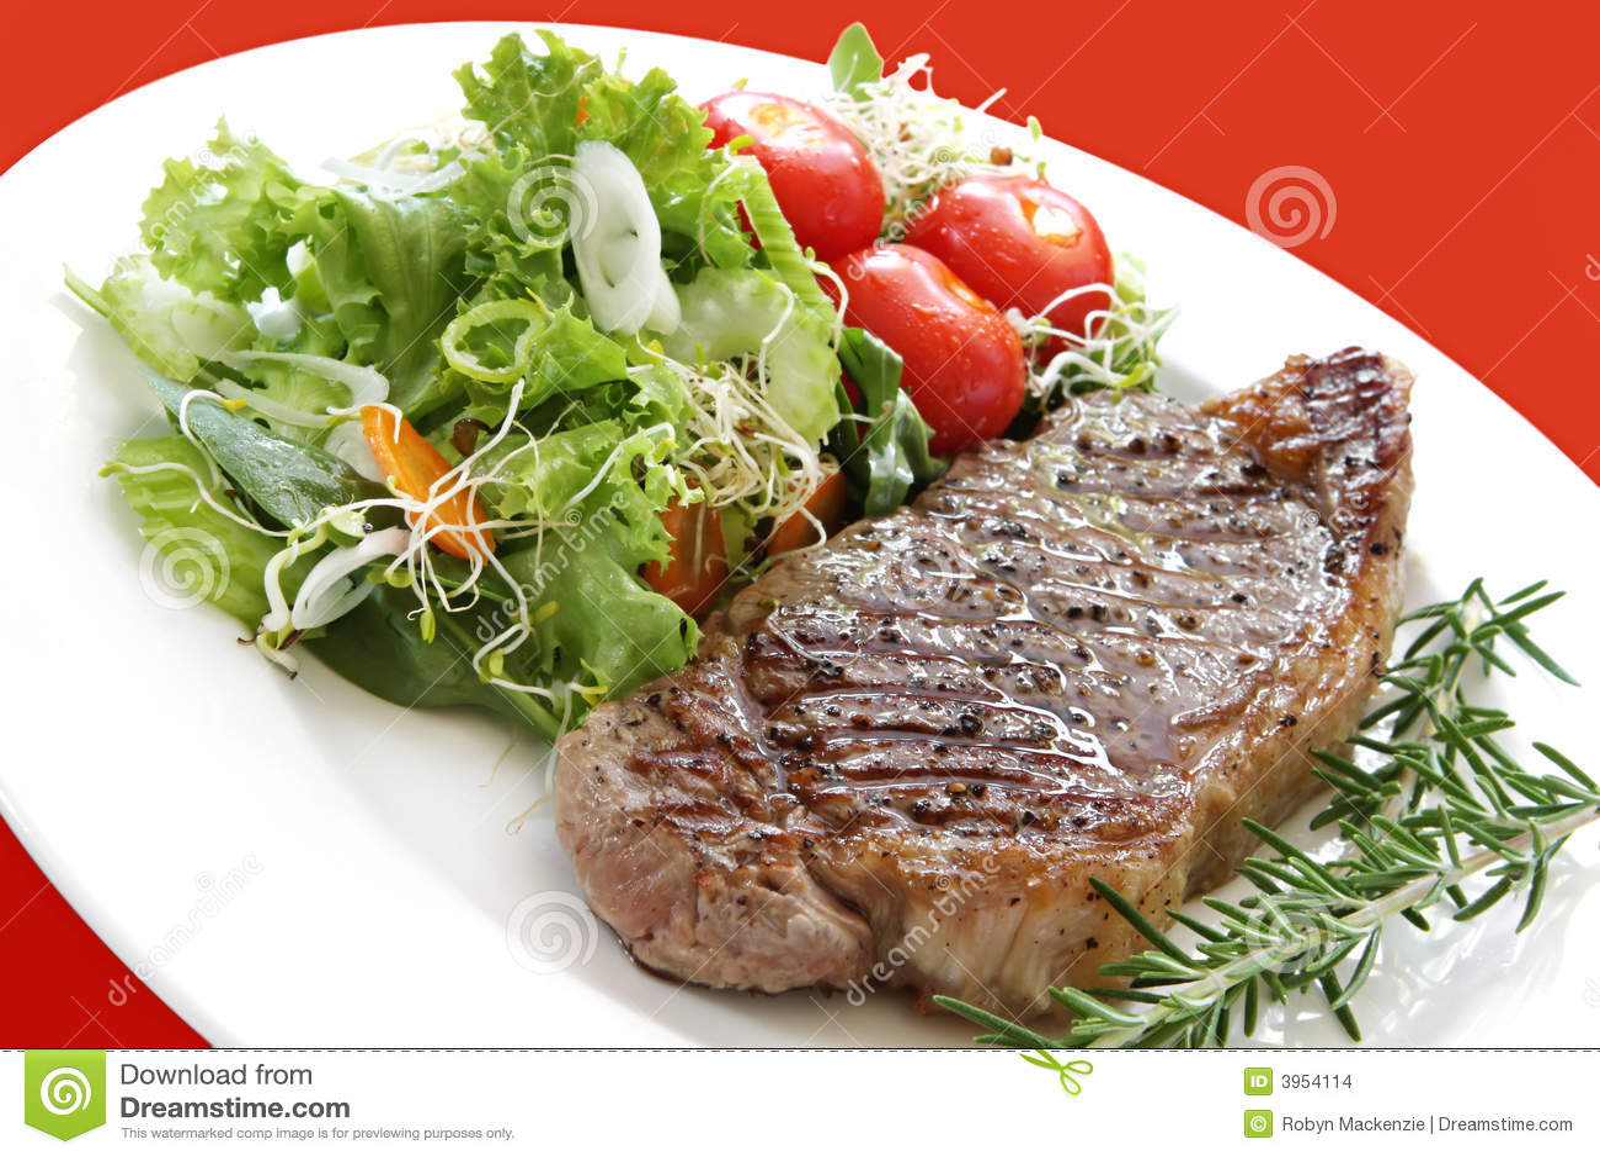 Grilled steak with salad. Porterhouse or New York strip steak, grilled ...